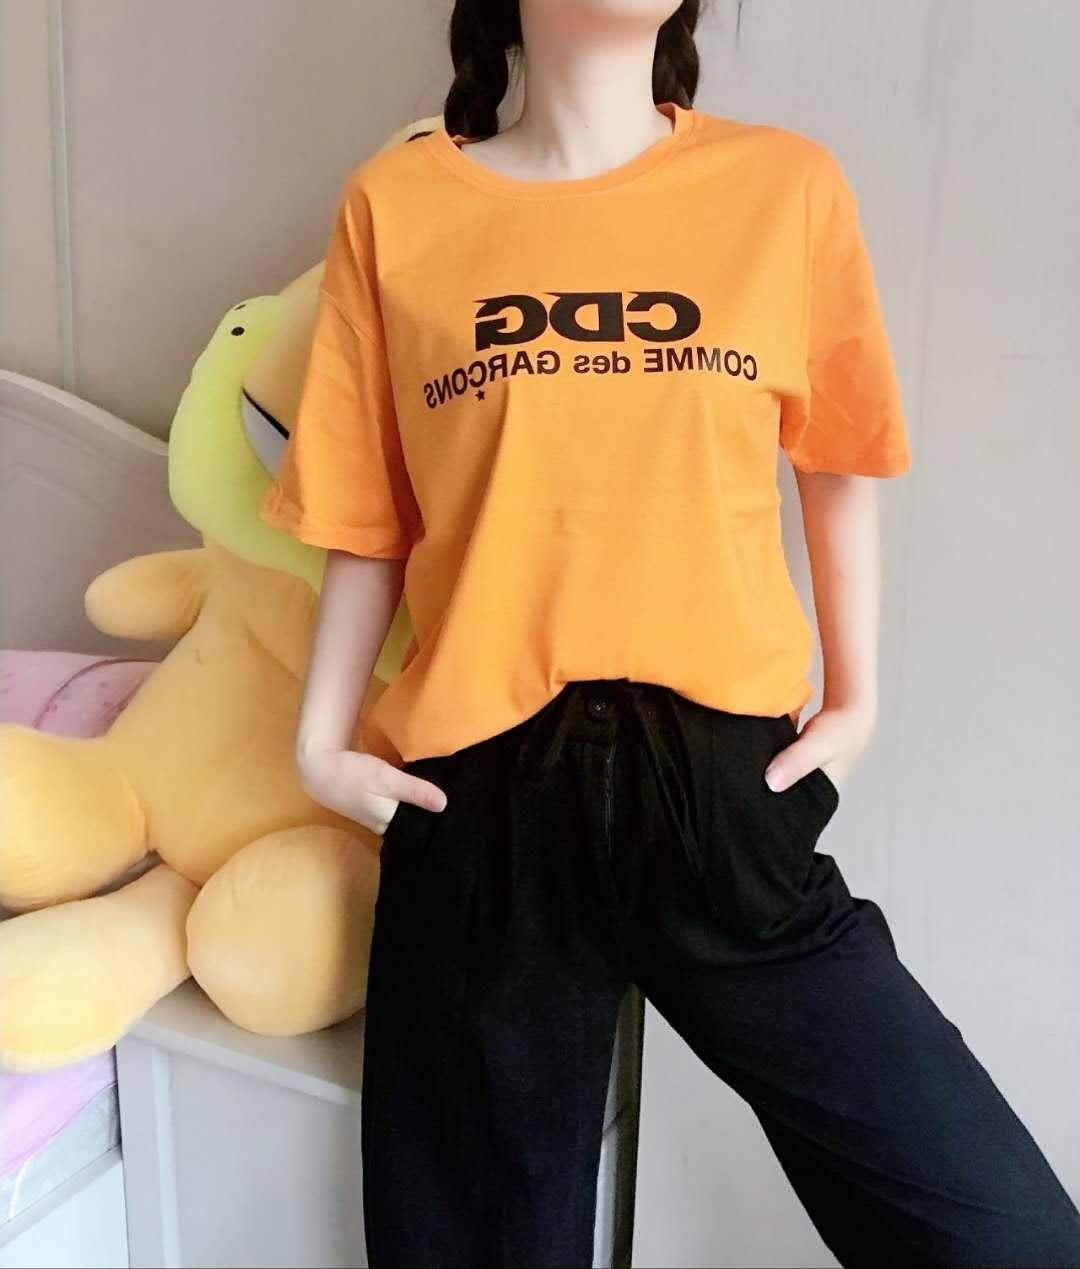 Frauen Designer-T-Shirts Marke Tees Solid Color Letters gedruckt kurzen Ärmeln Muster zurück Stil Luxus Tops Mädchen Paar-T-Shirts